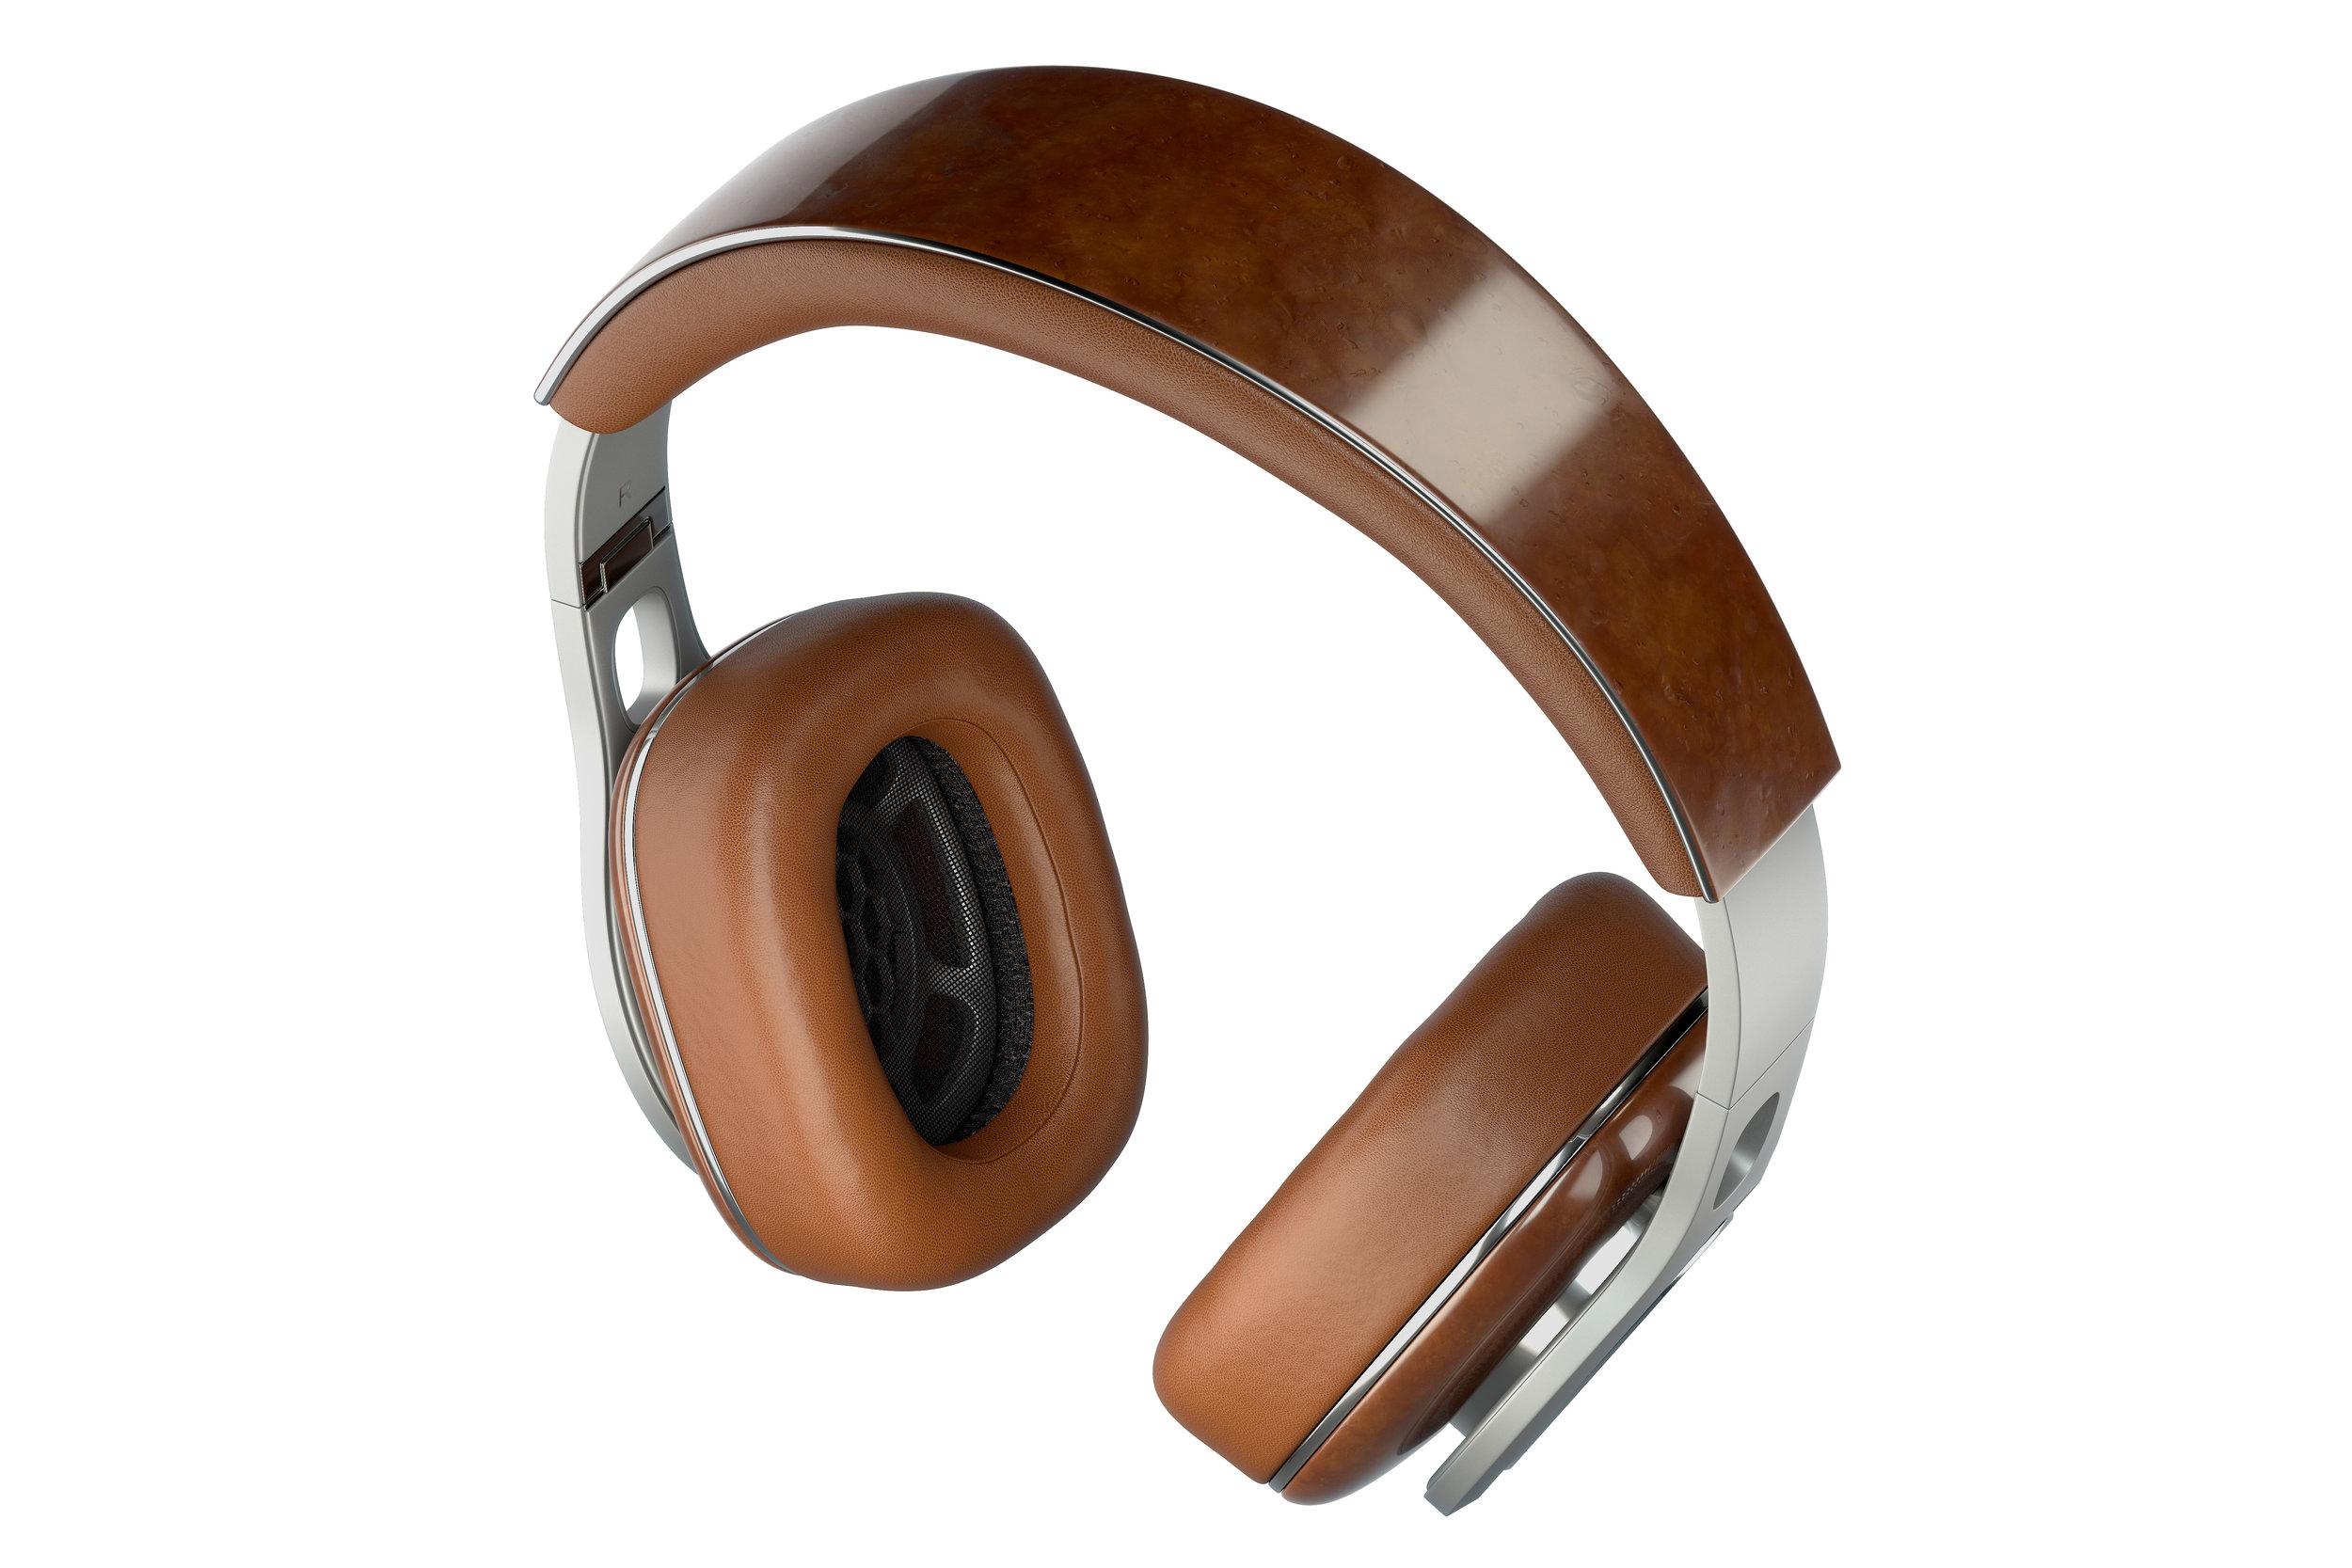 Headphones Image 03 -